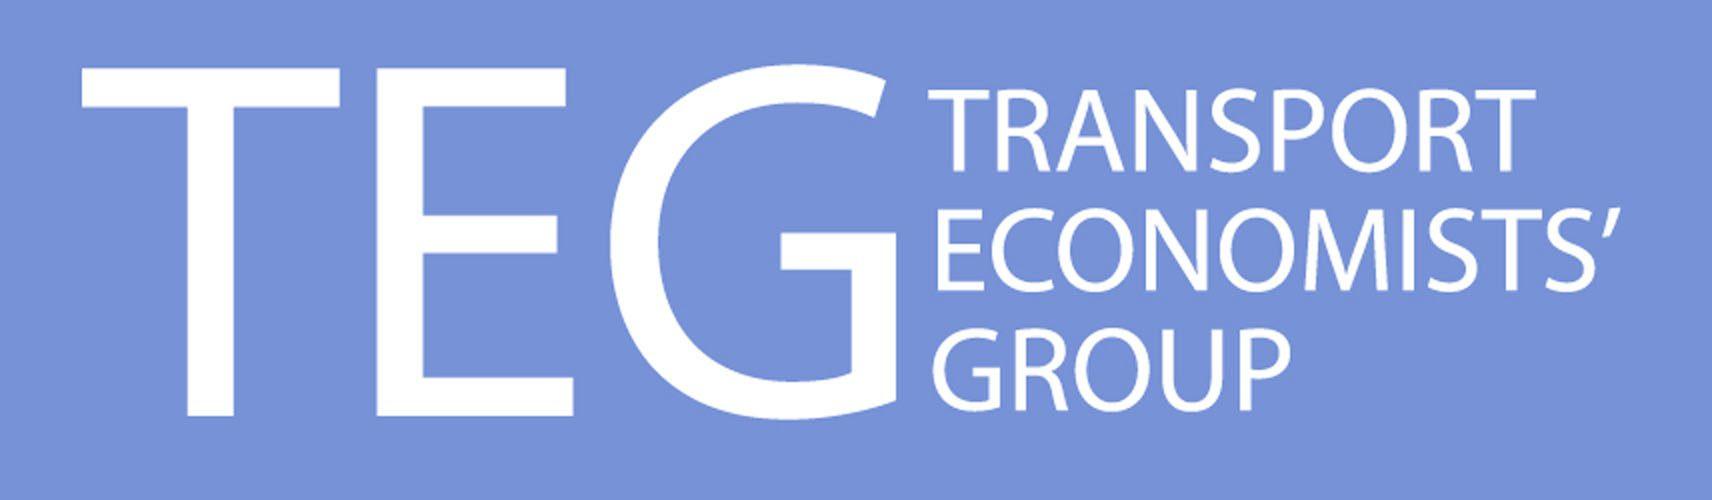 Transport Economists' Group